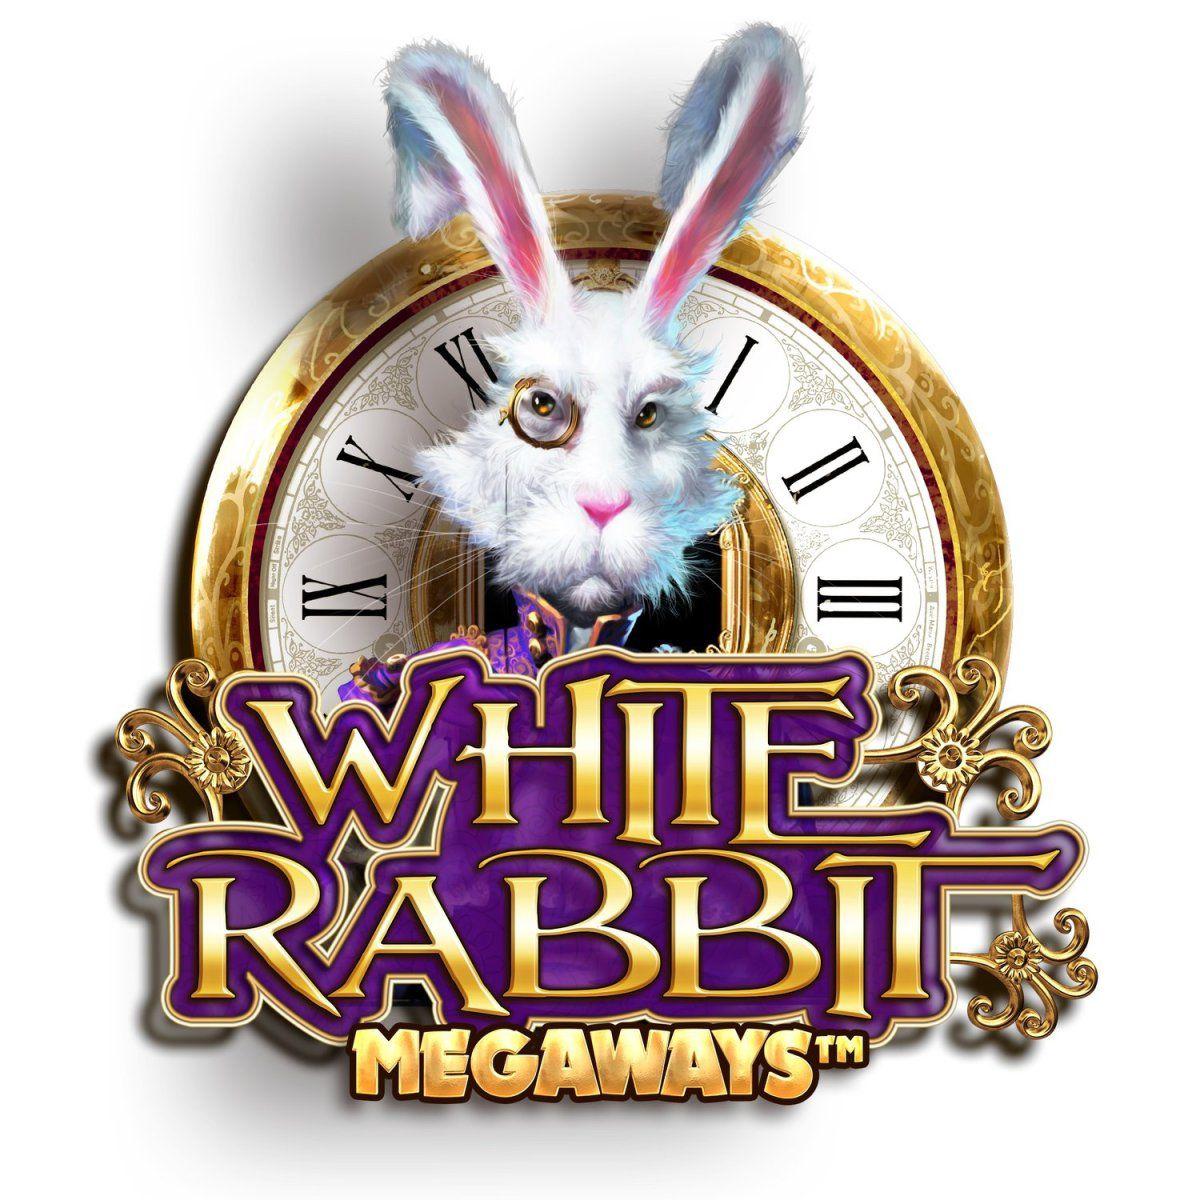 White rabbit slot review mega win best slot sites here gaming white rabbit slot review mega win best slot sites here thecheapjerseys Choice Image